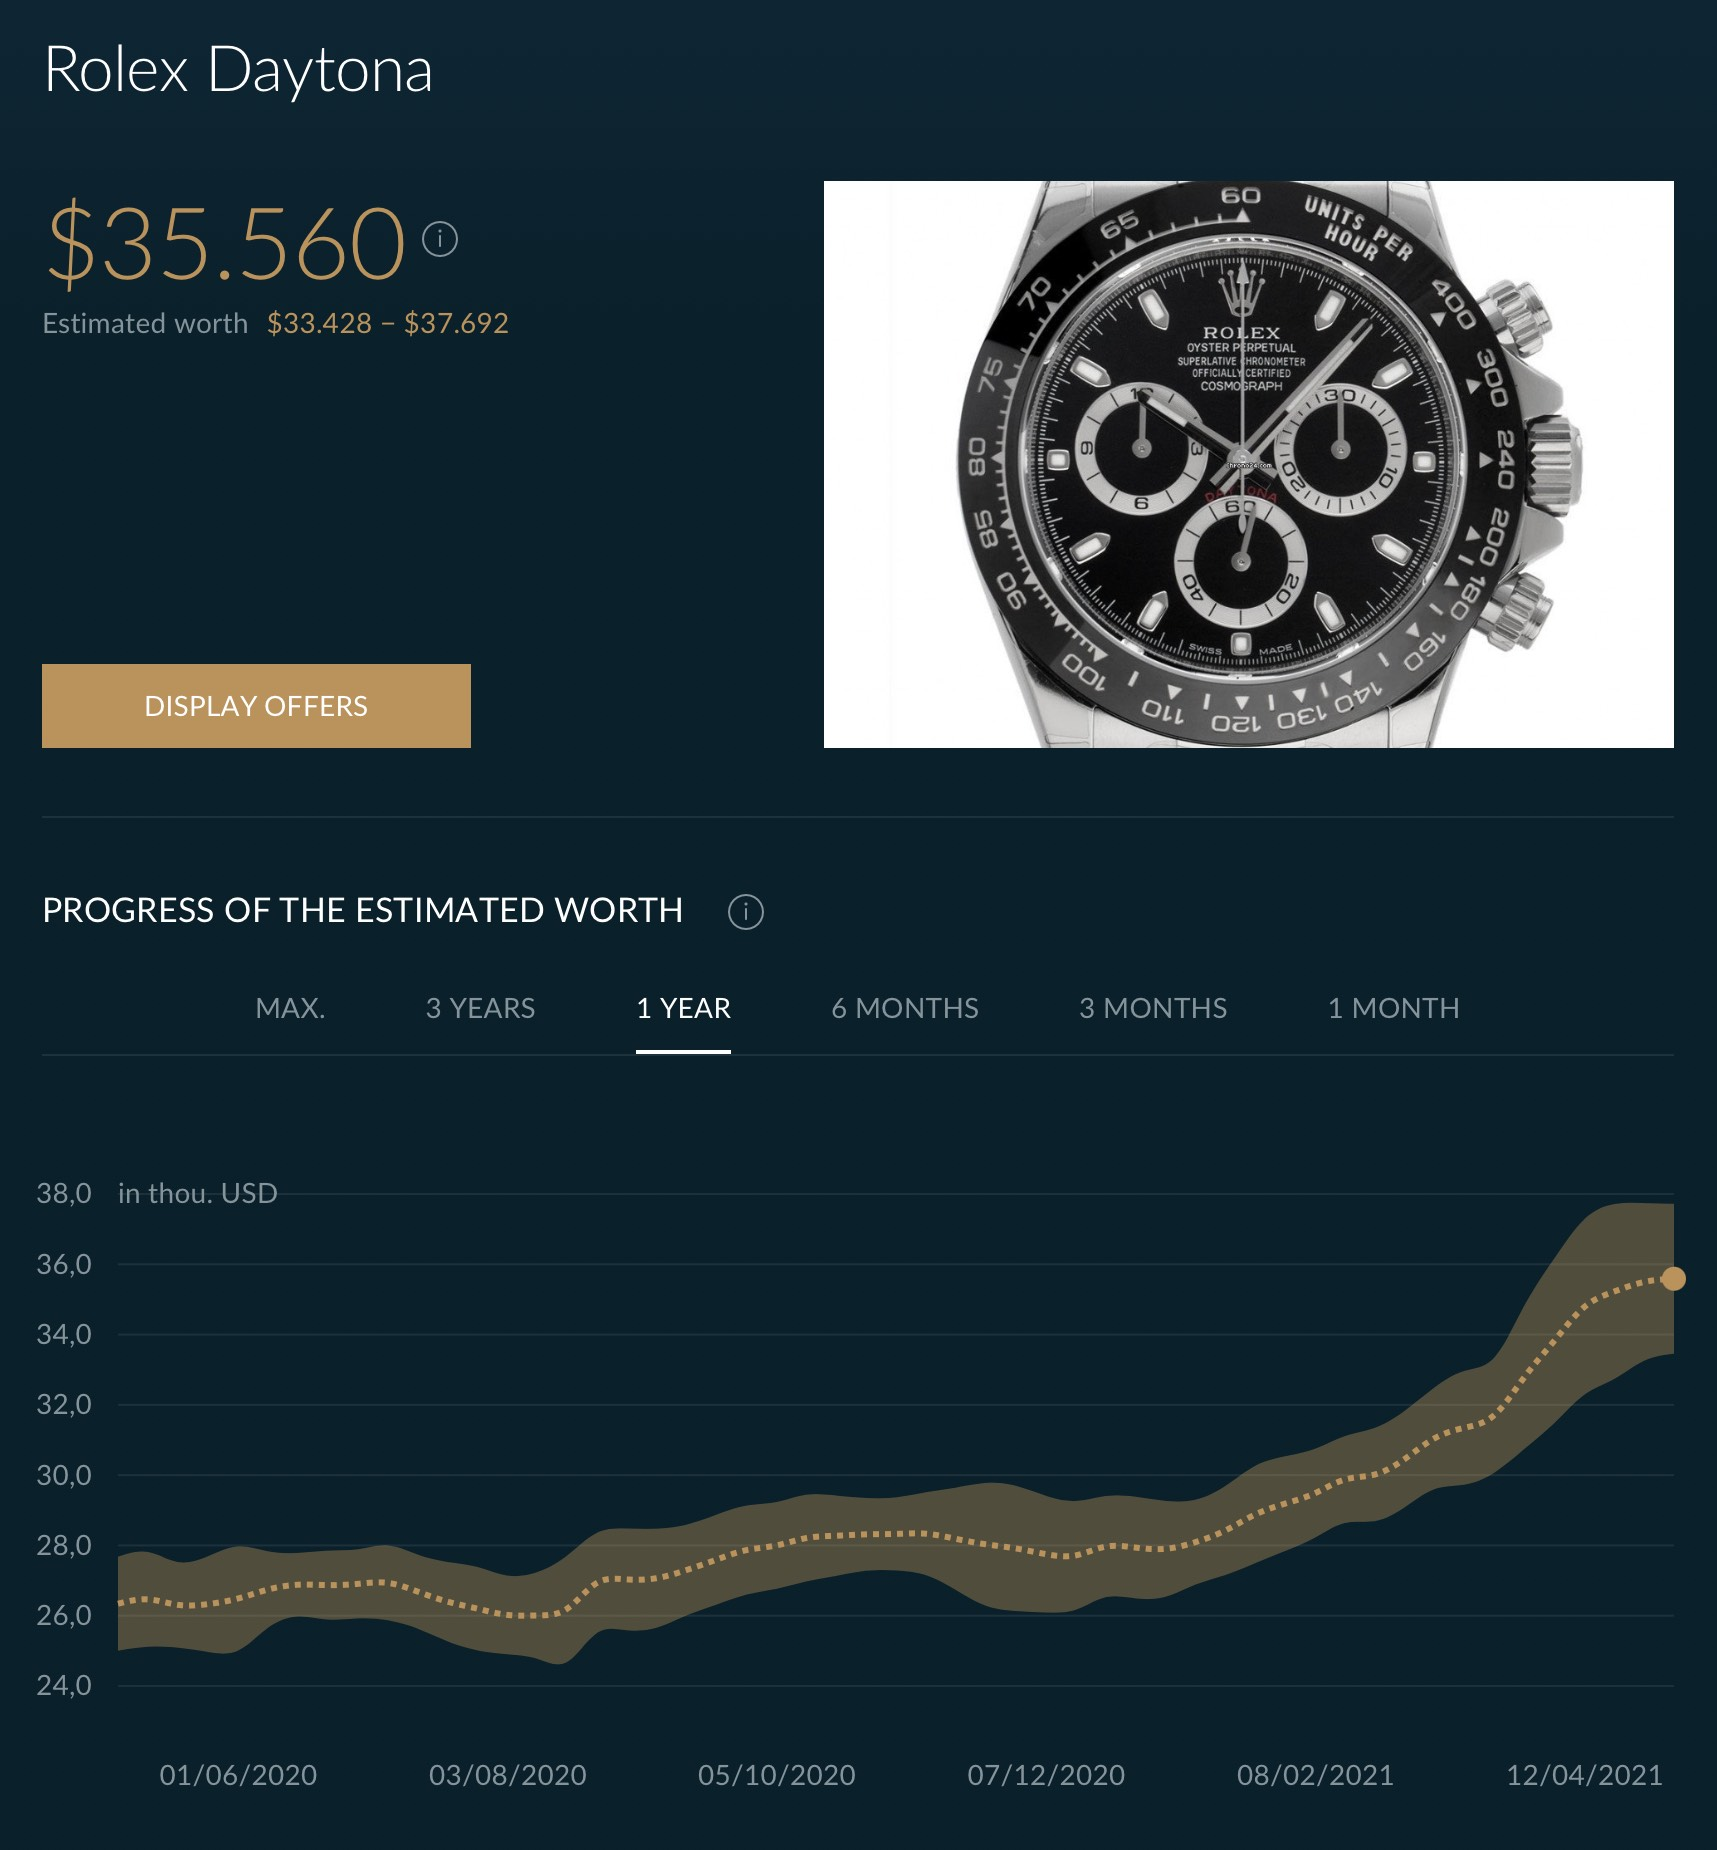 Rolex Daytona 116500LN Market analysis - continuous and insane rise price - 15